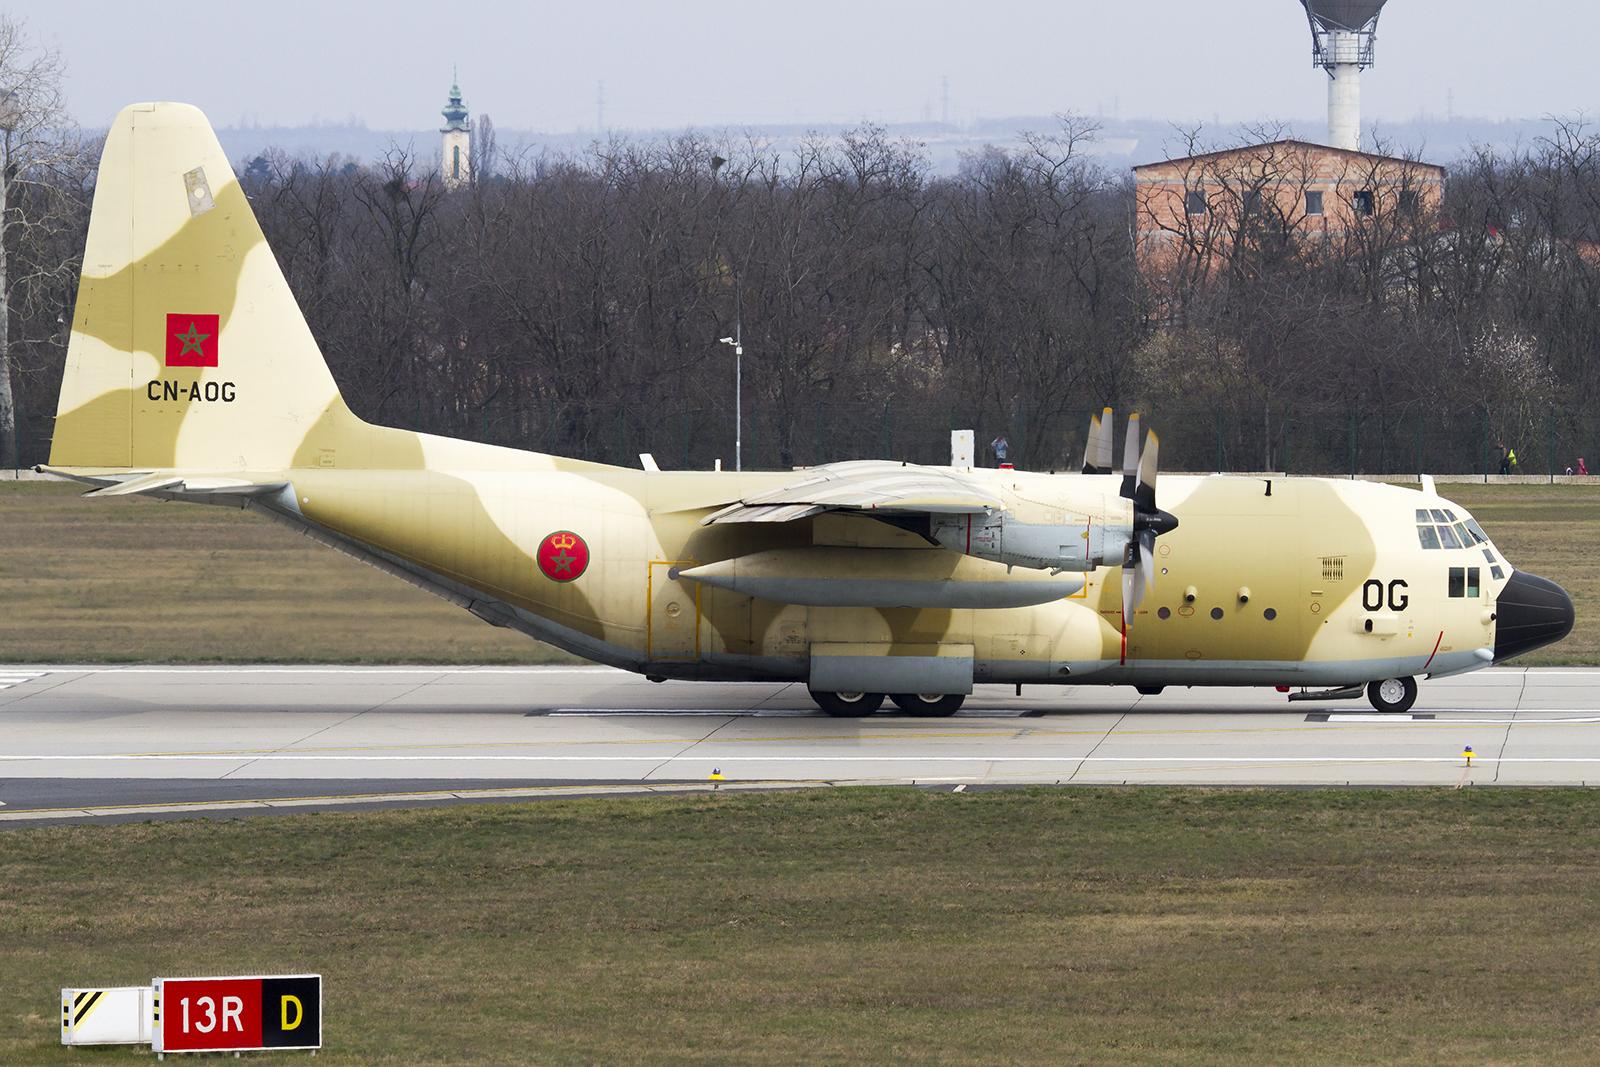 FRA: Photos d'avions de transport - Page 27 25820134640_6d6ac5125a_o